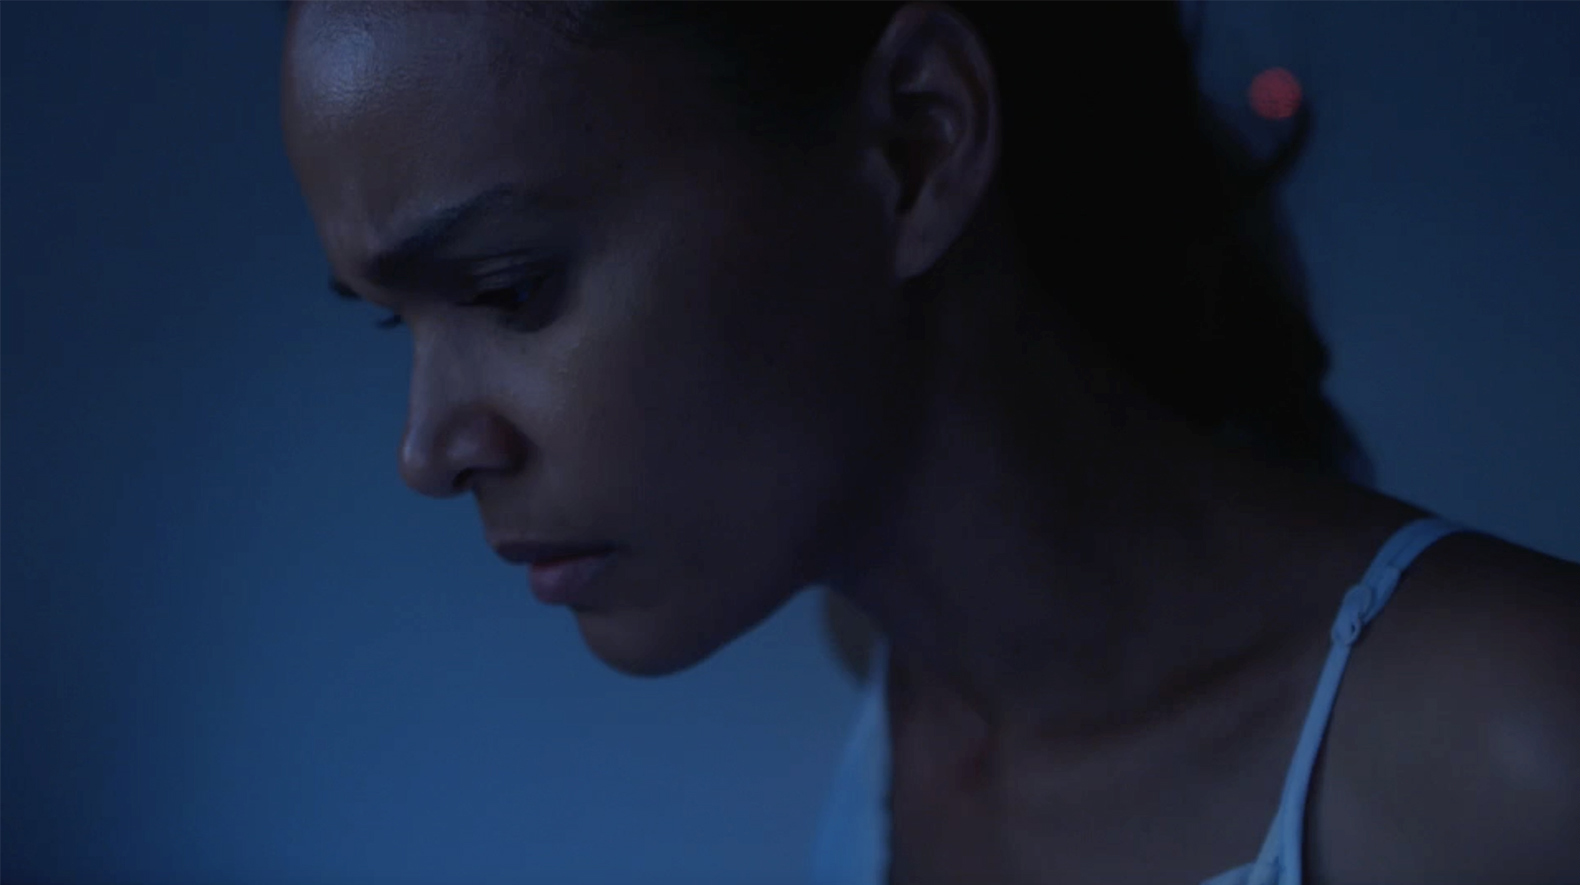 Unspoken | By Danae Grandison | Jamaica